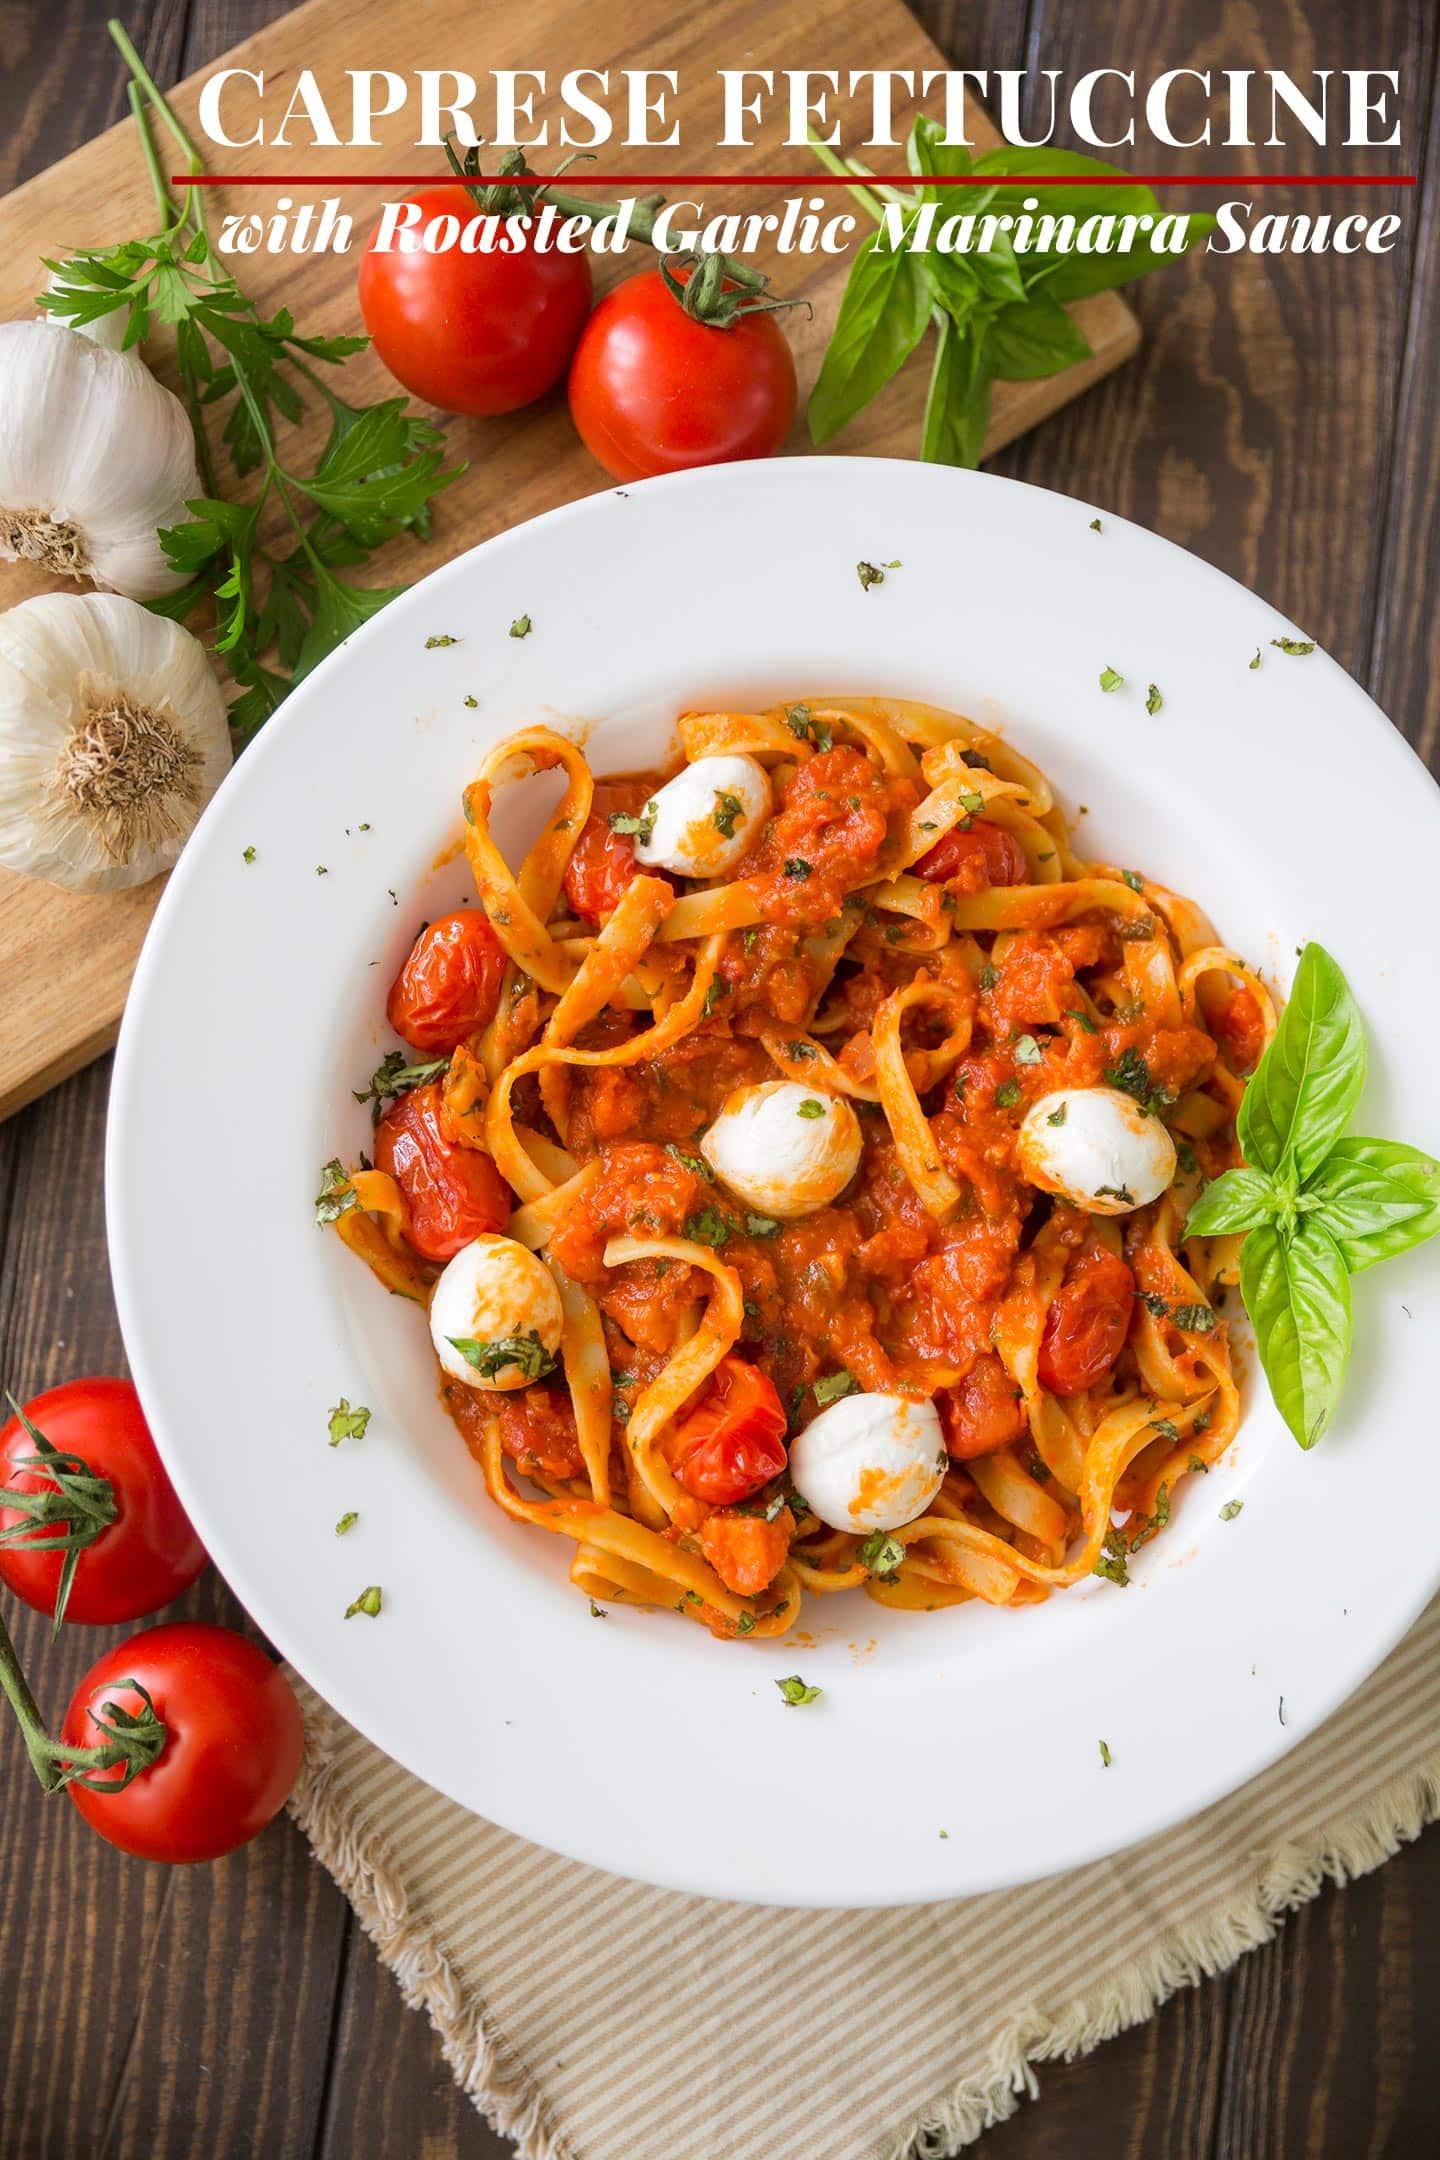 http://pizzazzerie.com/wp-content/uploads/2017/08/caprese-fettuccini.jpg